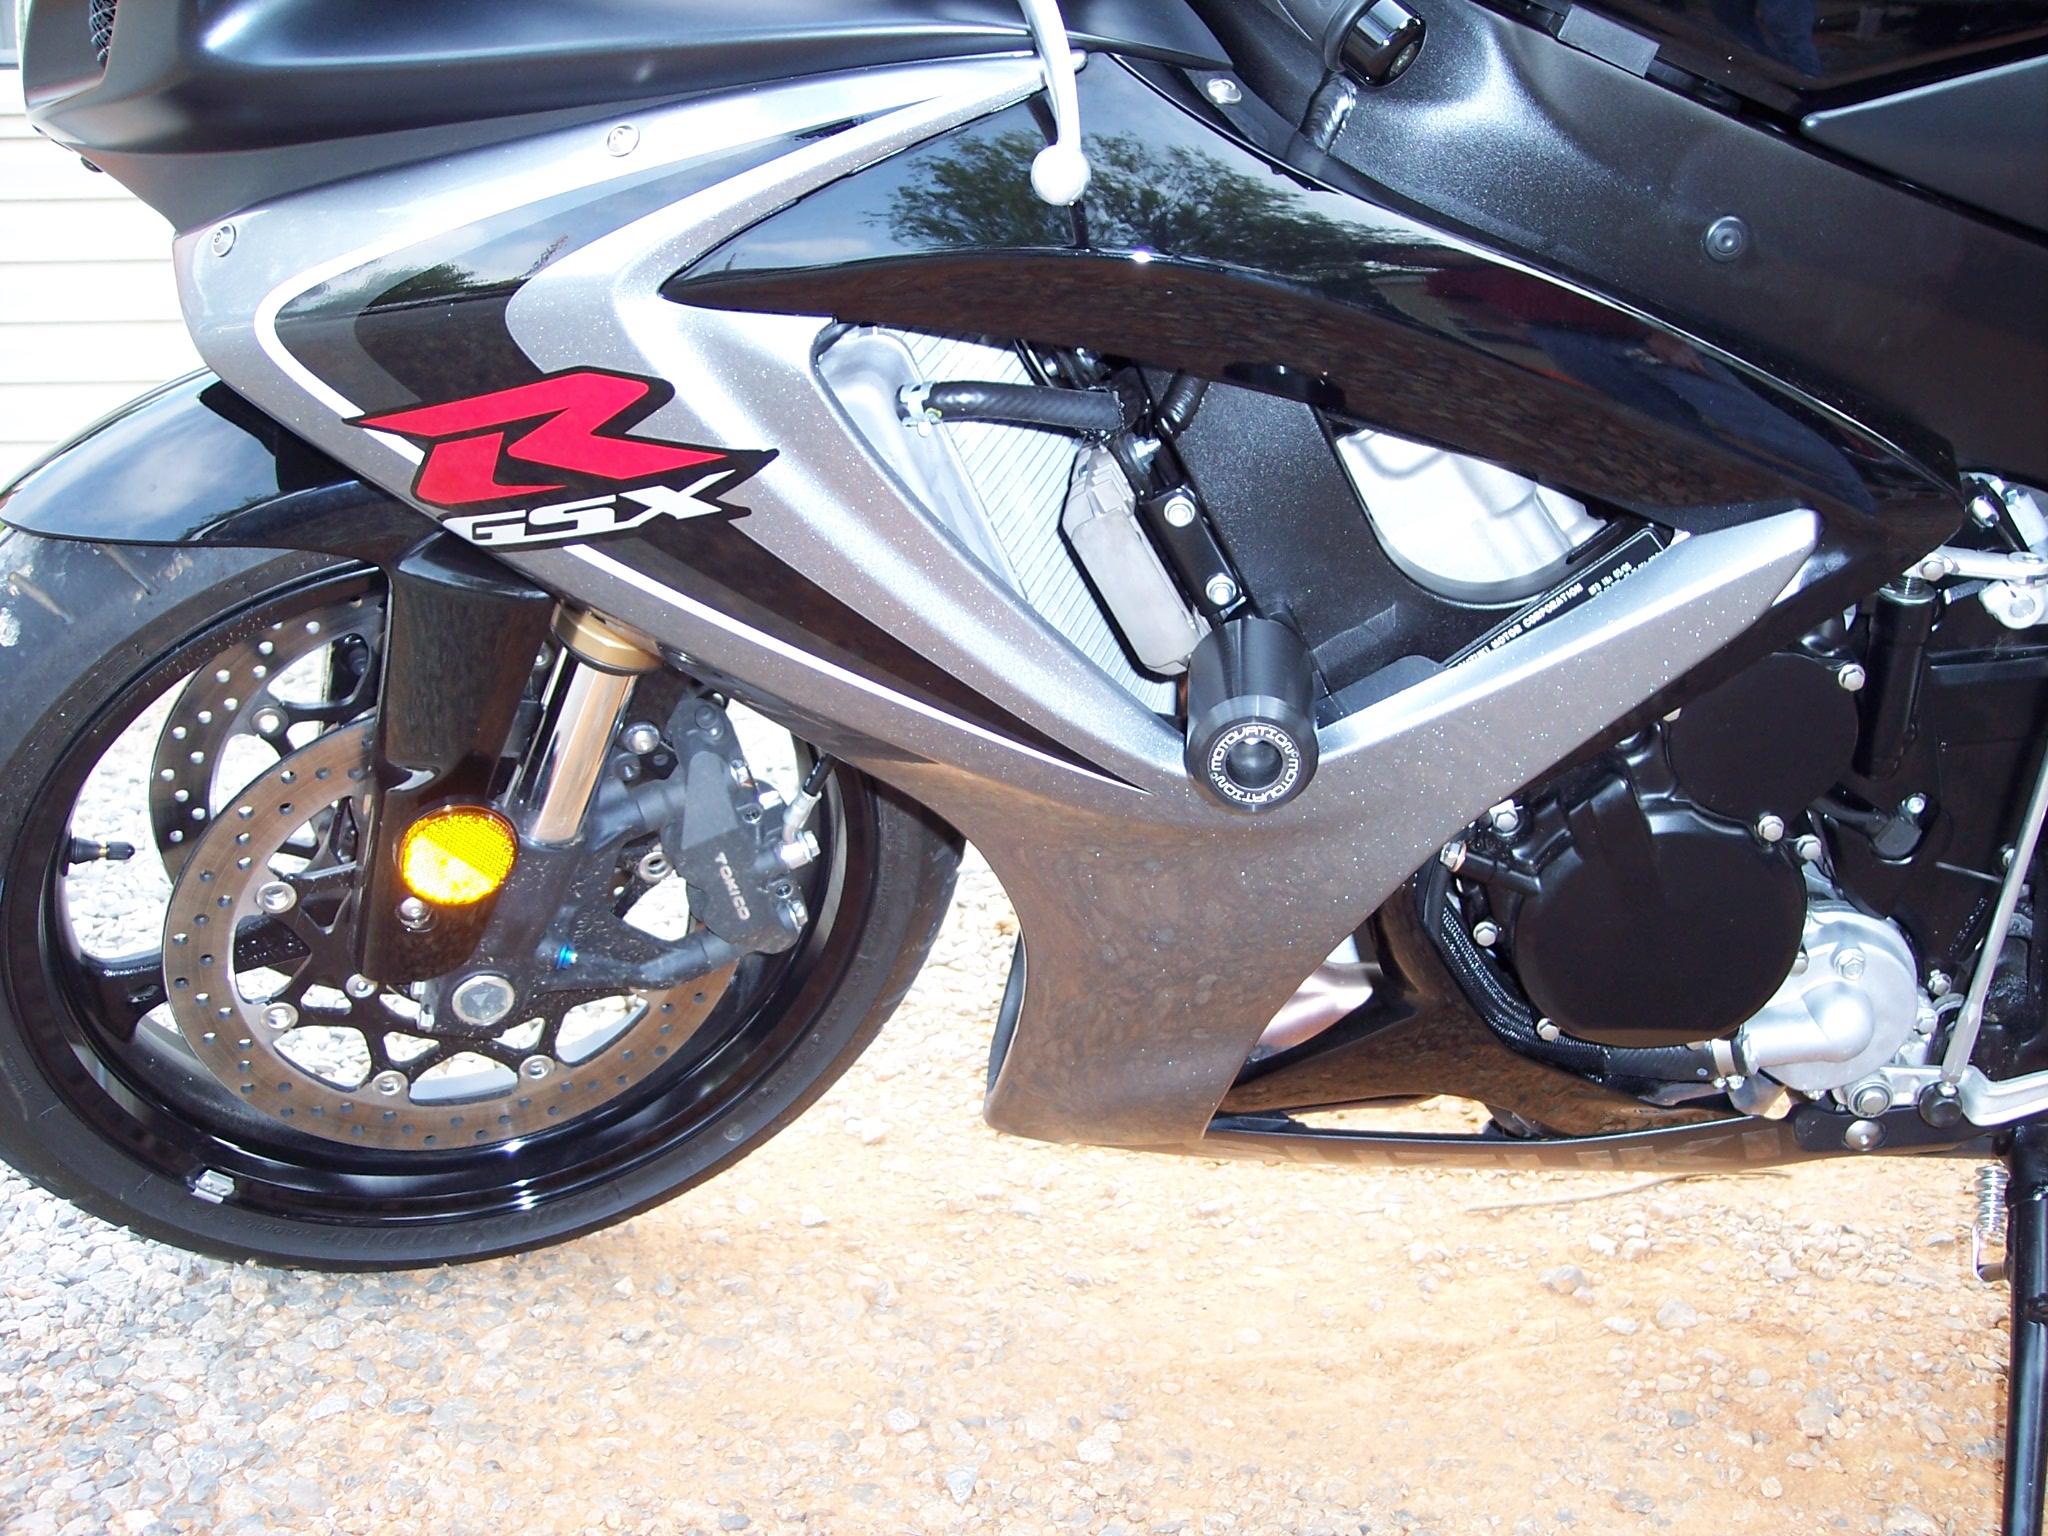 Suzuki Gsxr 600 >> SBN Tests Motovation No Cut Frame Sliders For The 2006 ...